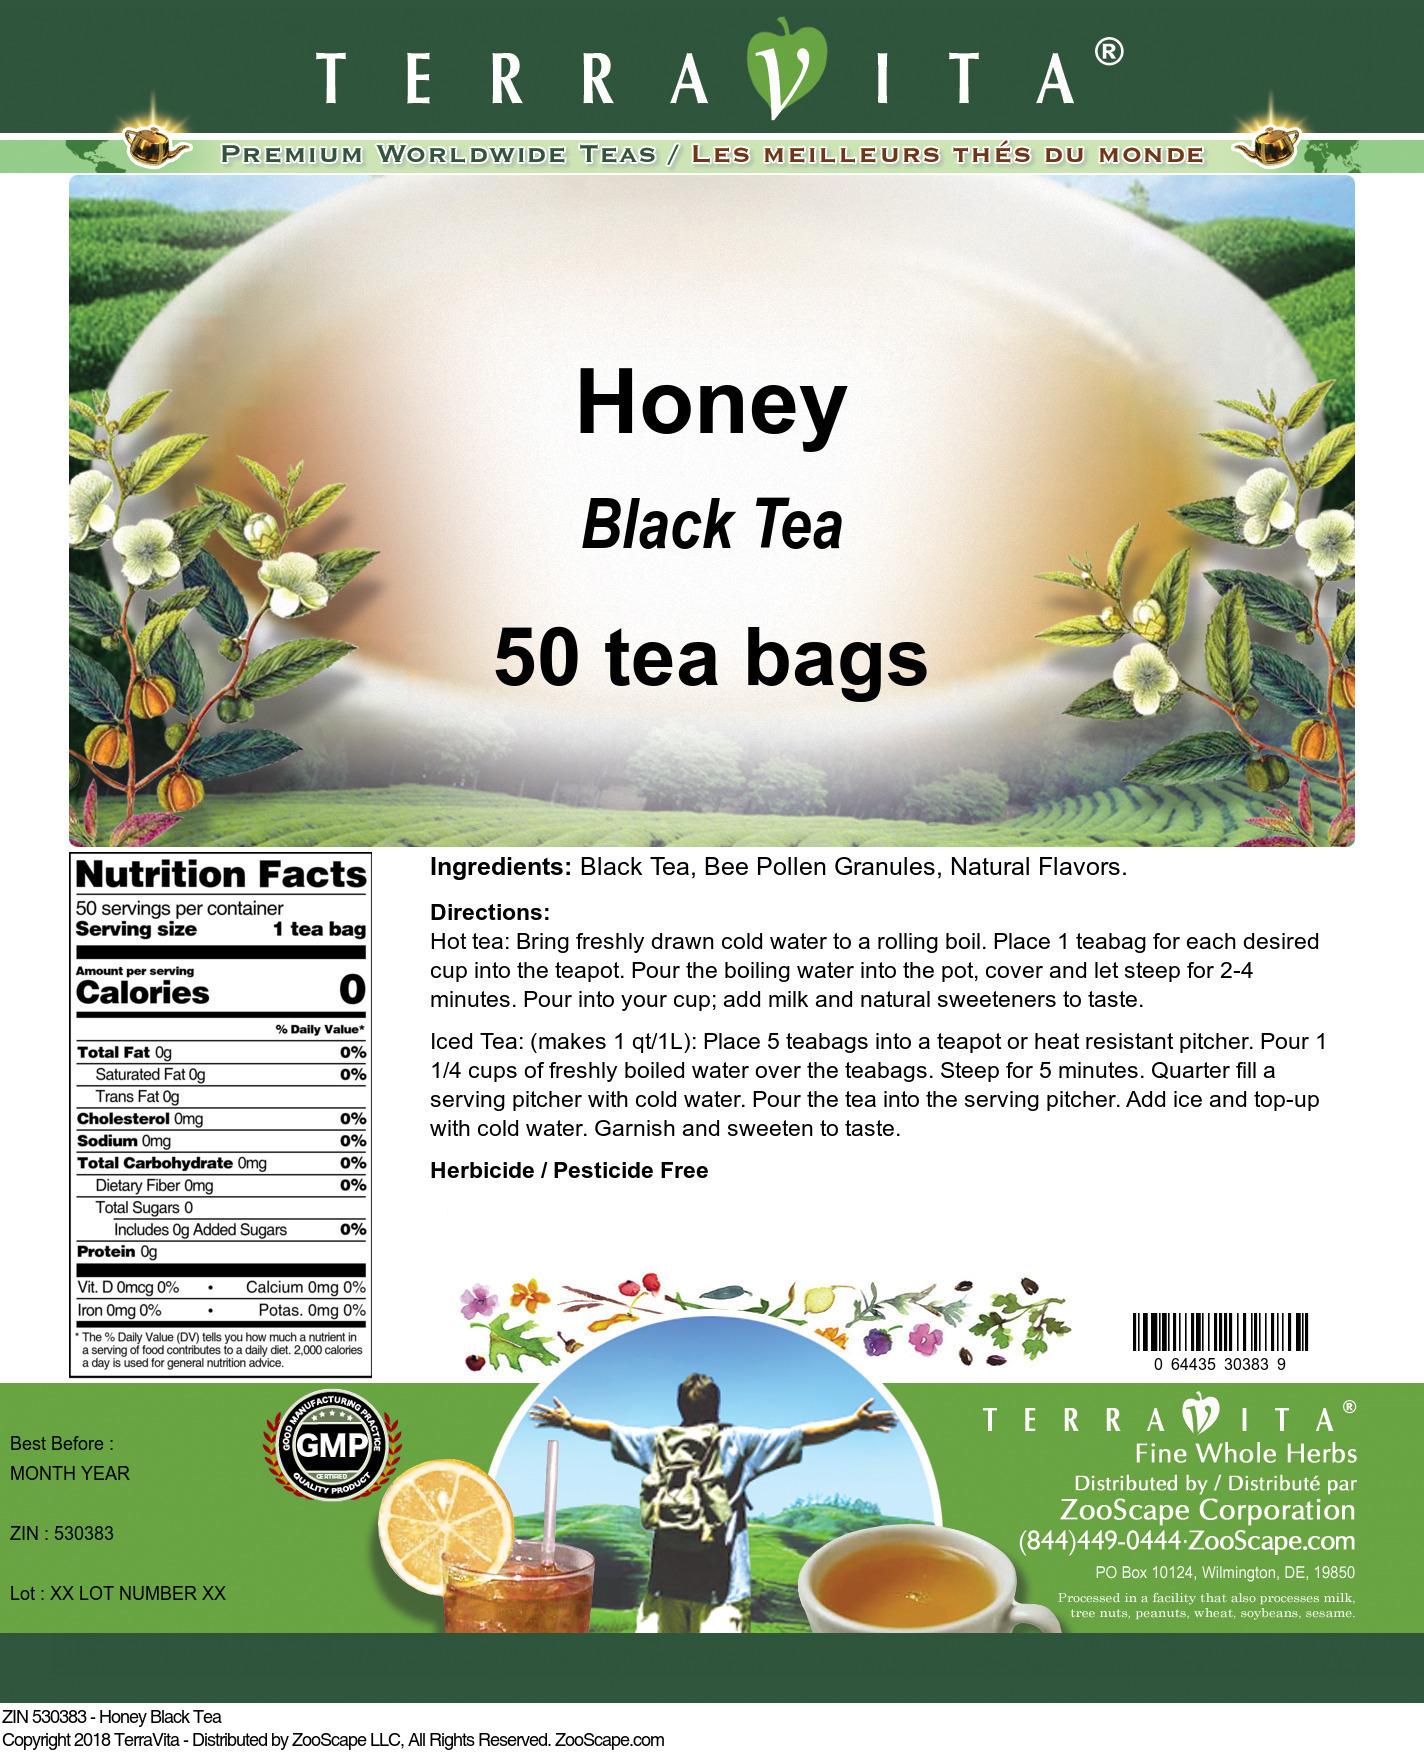 Honey Black Tea